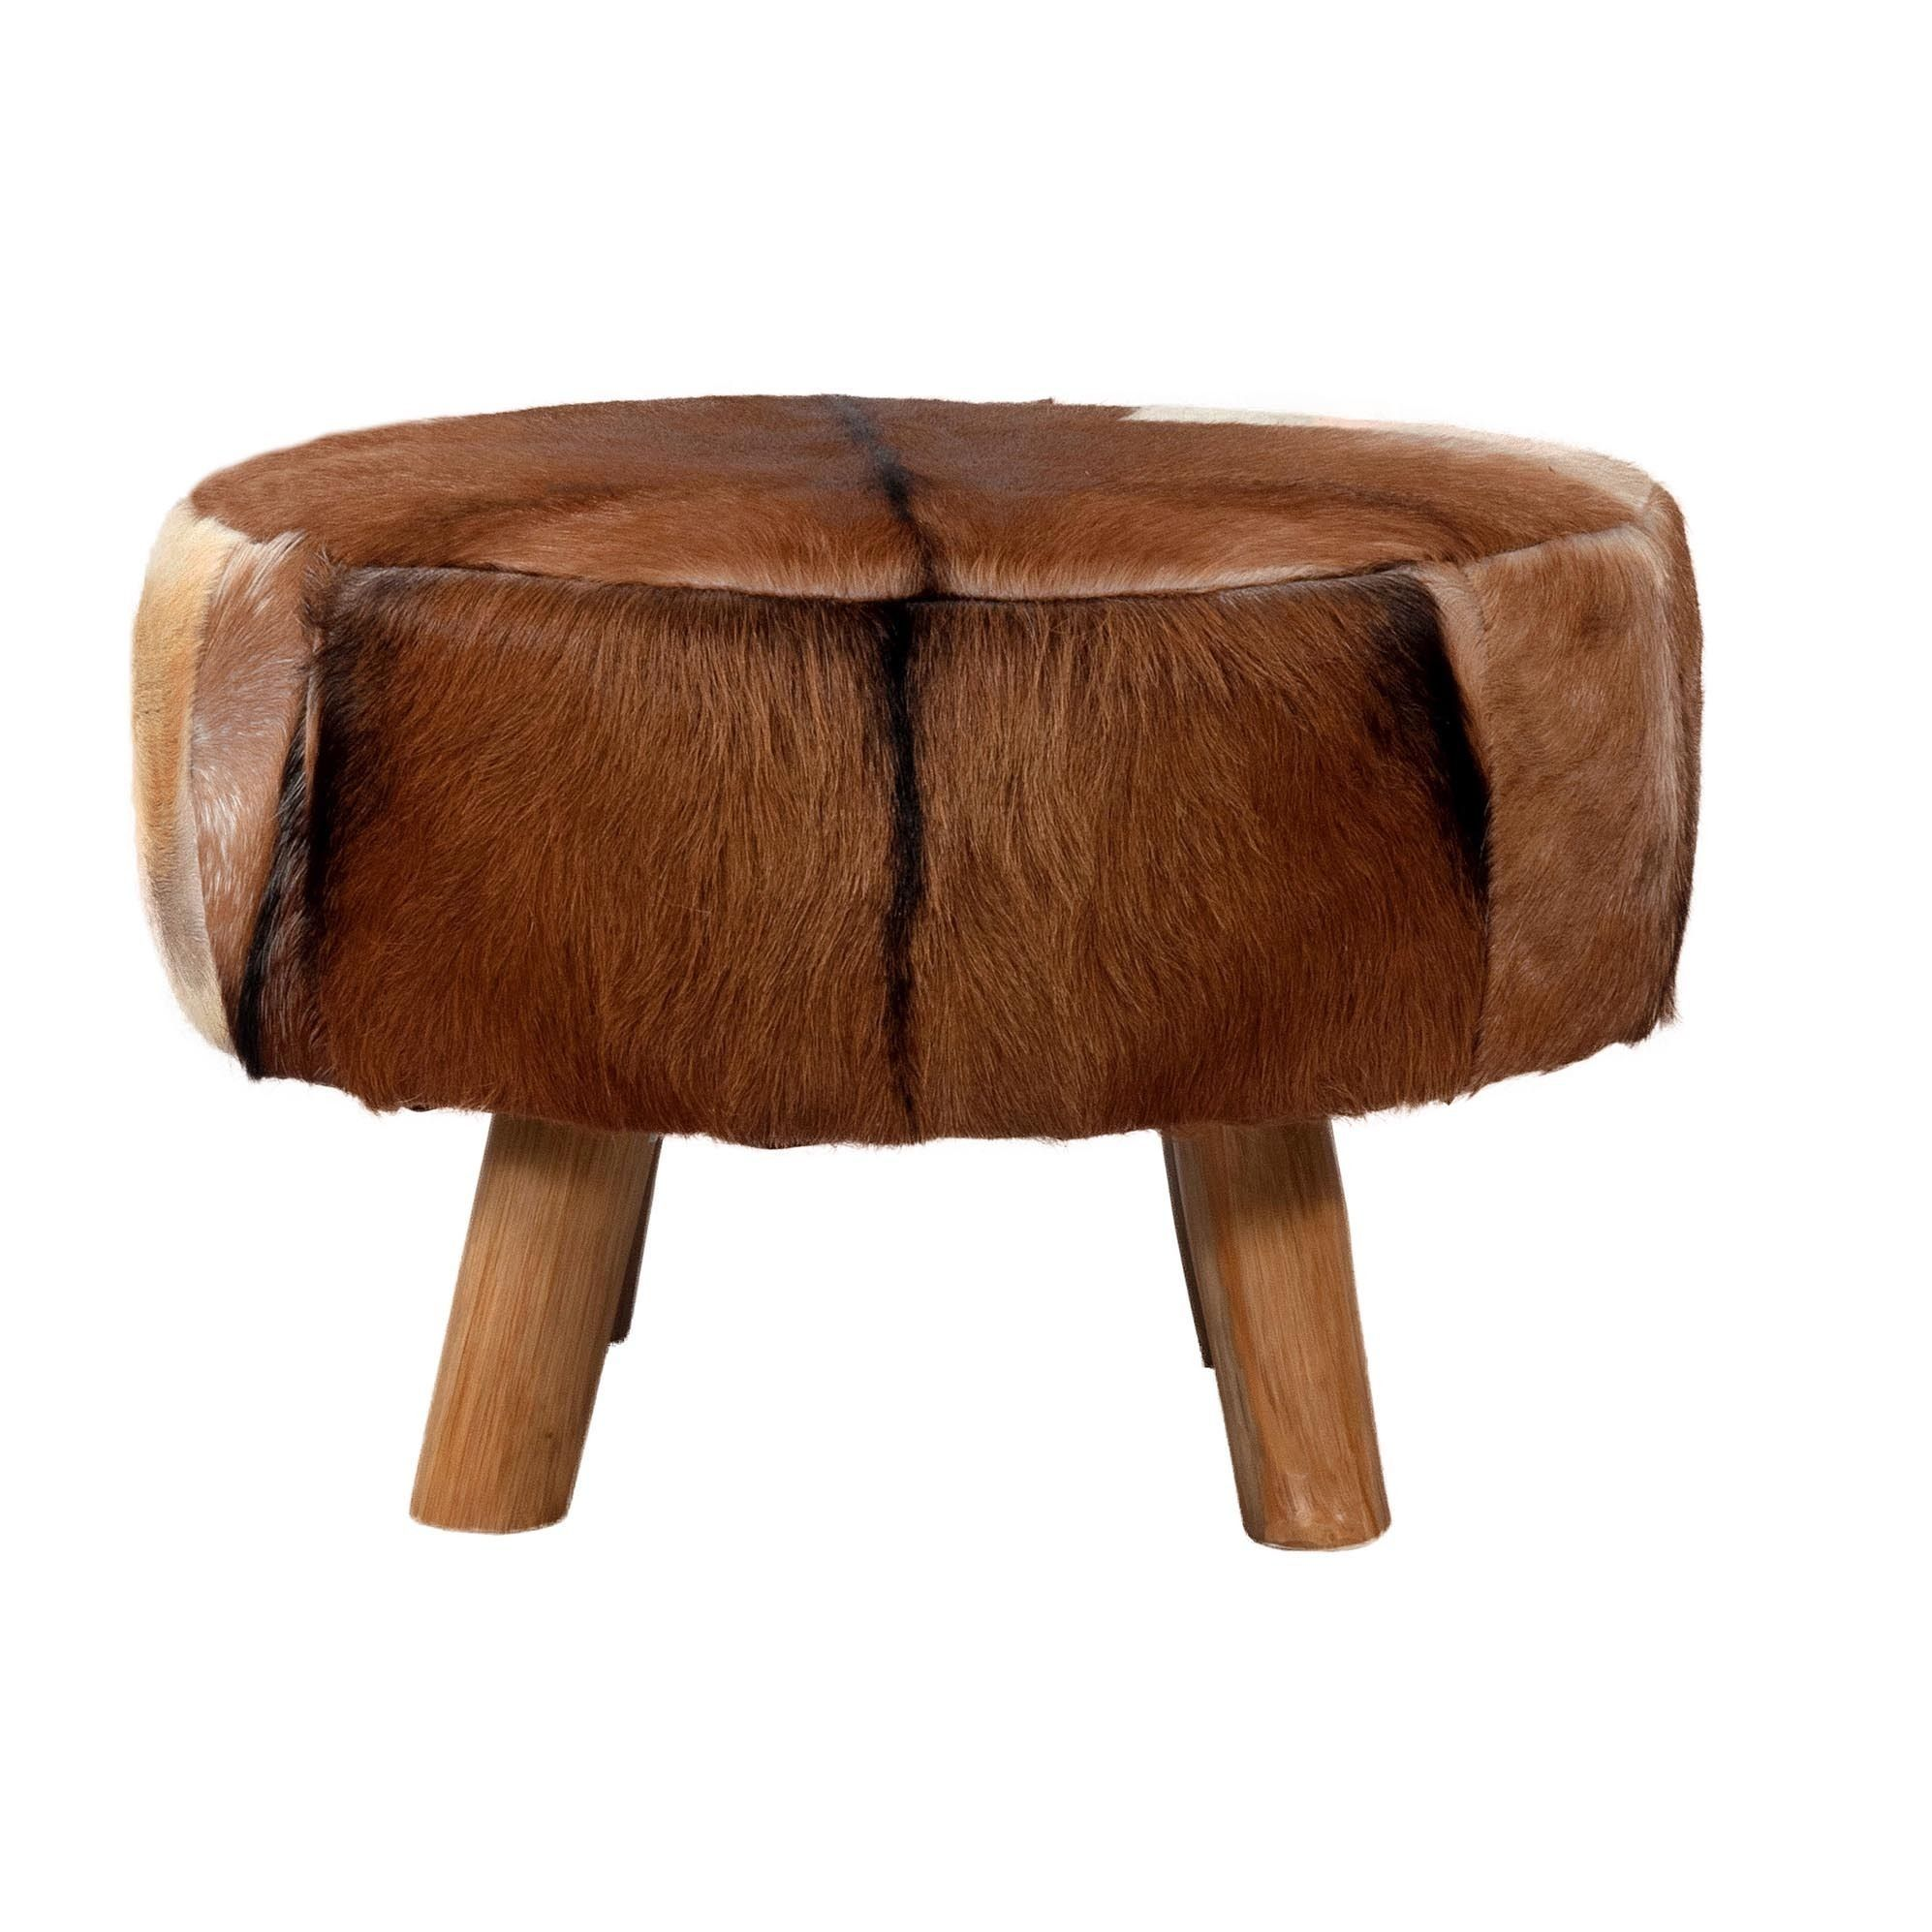 Pleasing Jeffan Safari Round Ottoman Small Brown Tan Beige Size Spiritservingveterans Wood Chair Design Ideas Spiritservingveteransorg